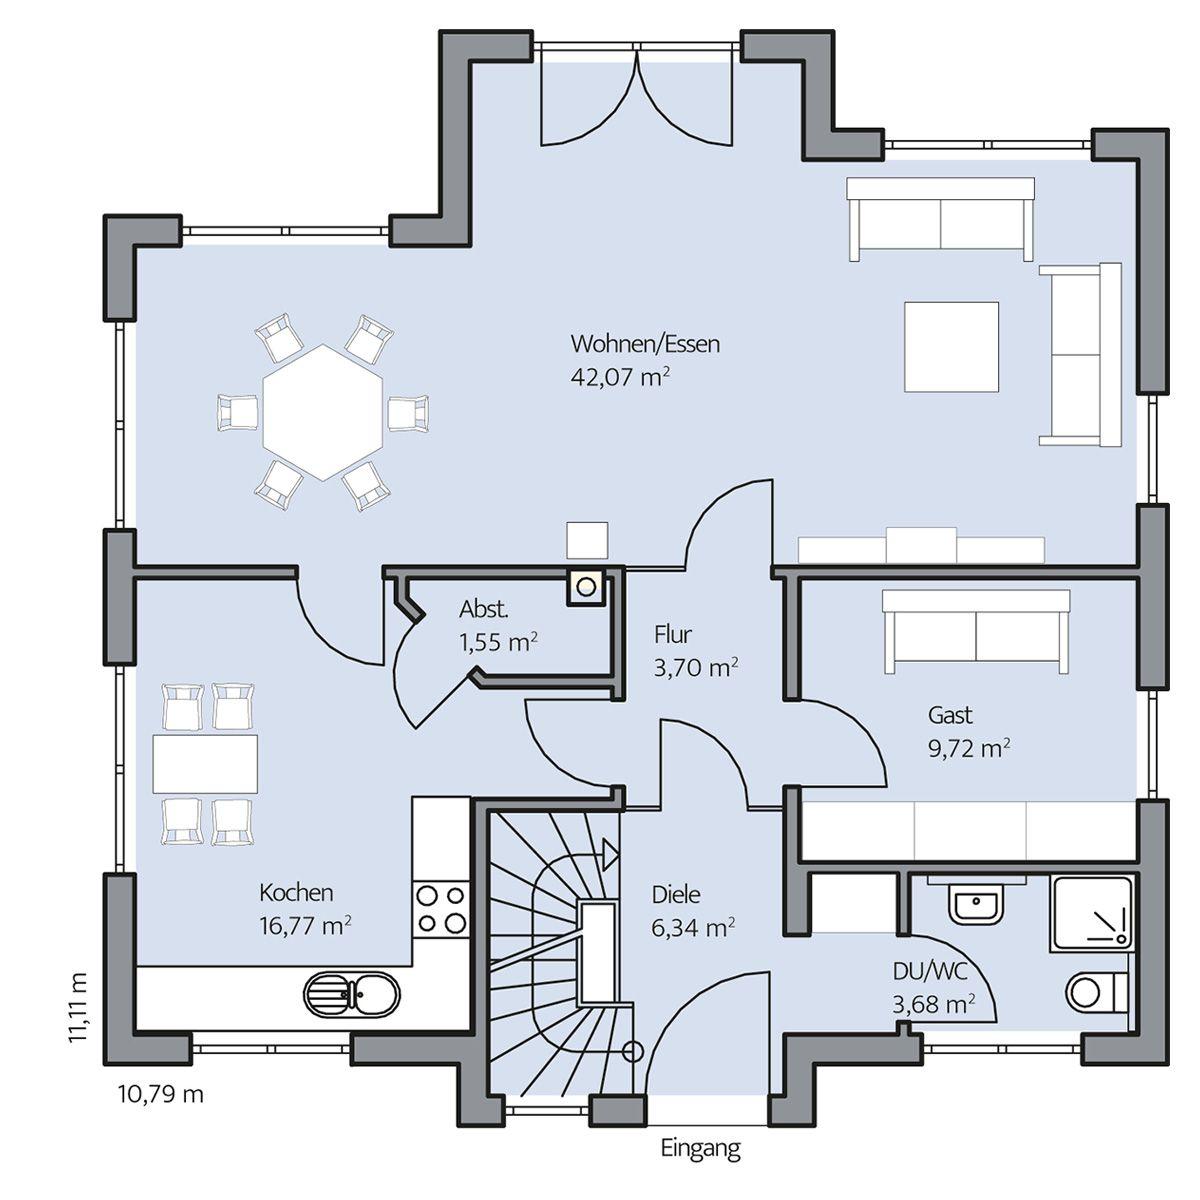 haus oswald erdgeschoss planos pinterest haus haus grundriss y haus bauen. Black Bedroom Furniture Sets. Home Design Ideas